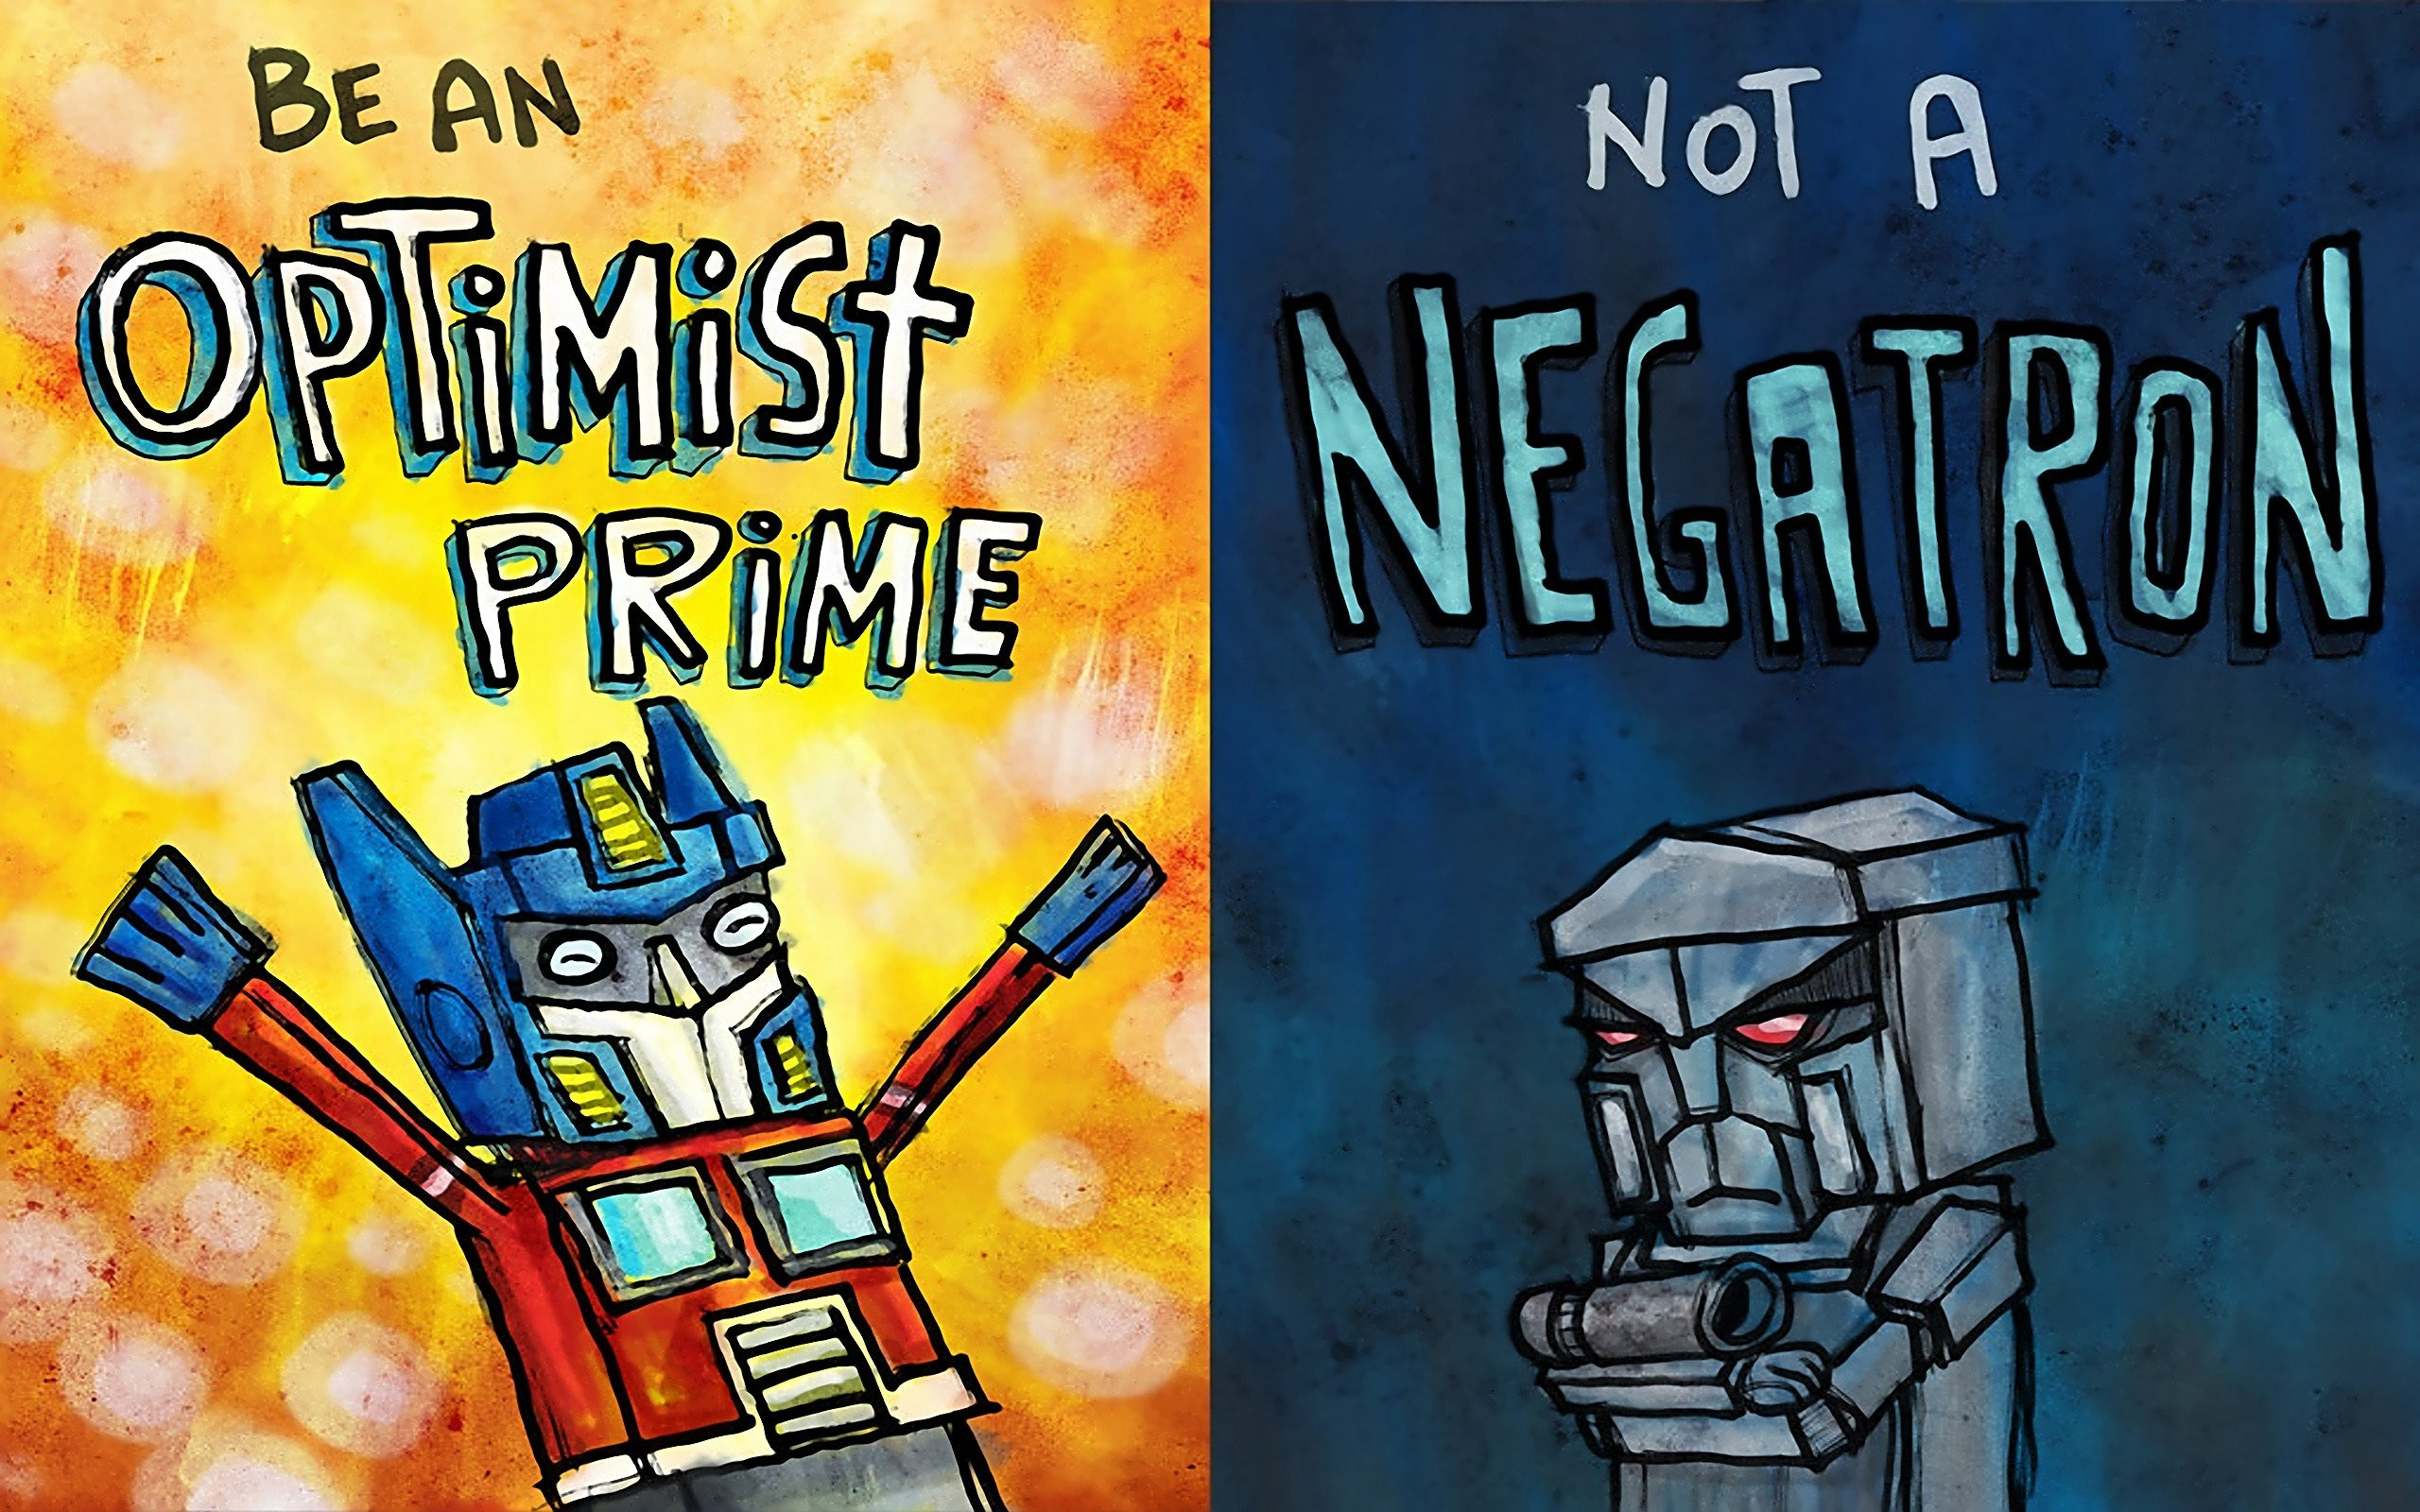 Cartoons Megatron Motivation Optimus Prime Robots Transformers